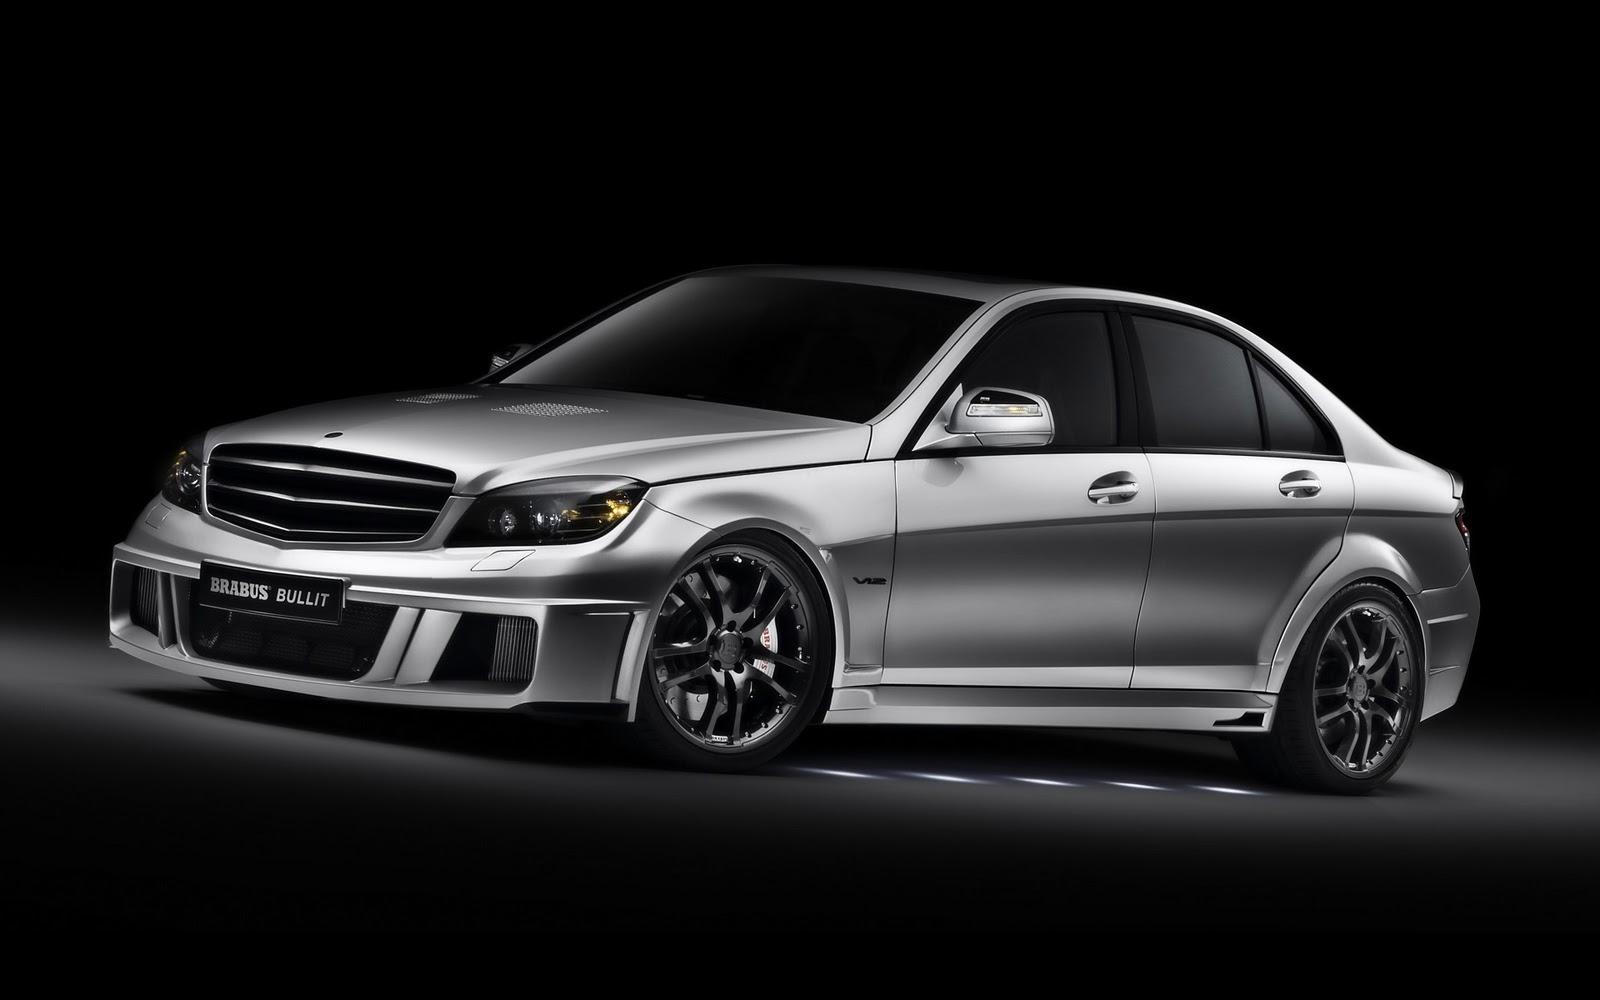 Best Sports Cars at Detroit 2013 - Gear Patrol |The Best Sport Cars 2013